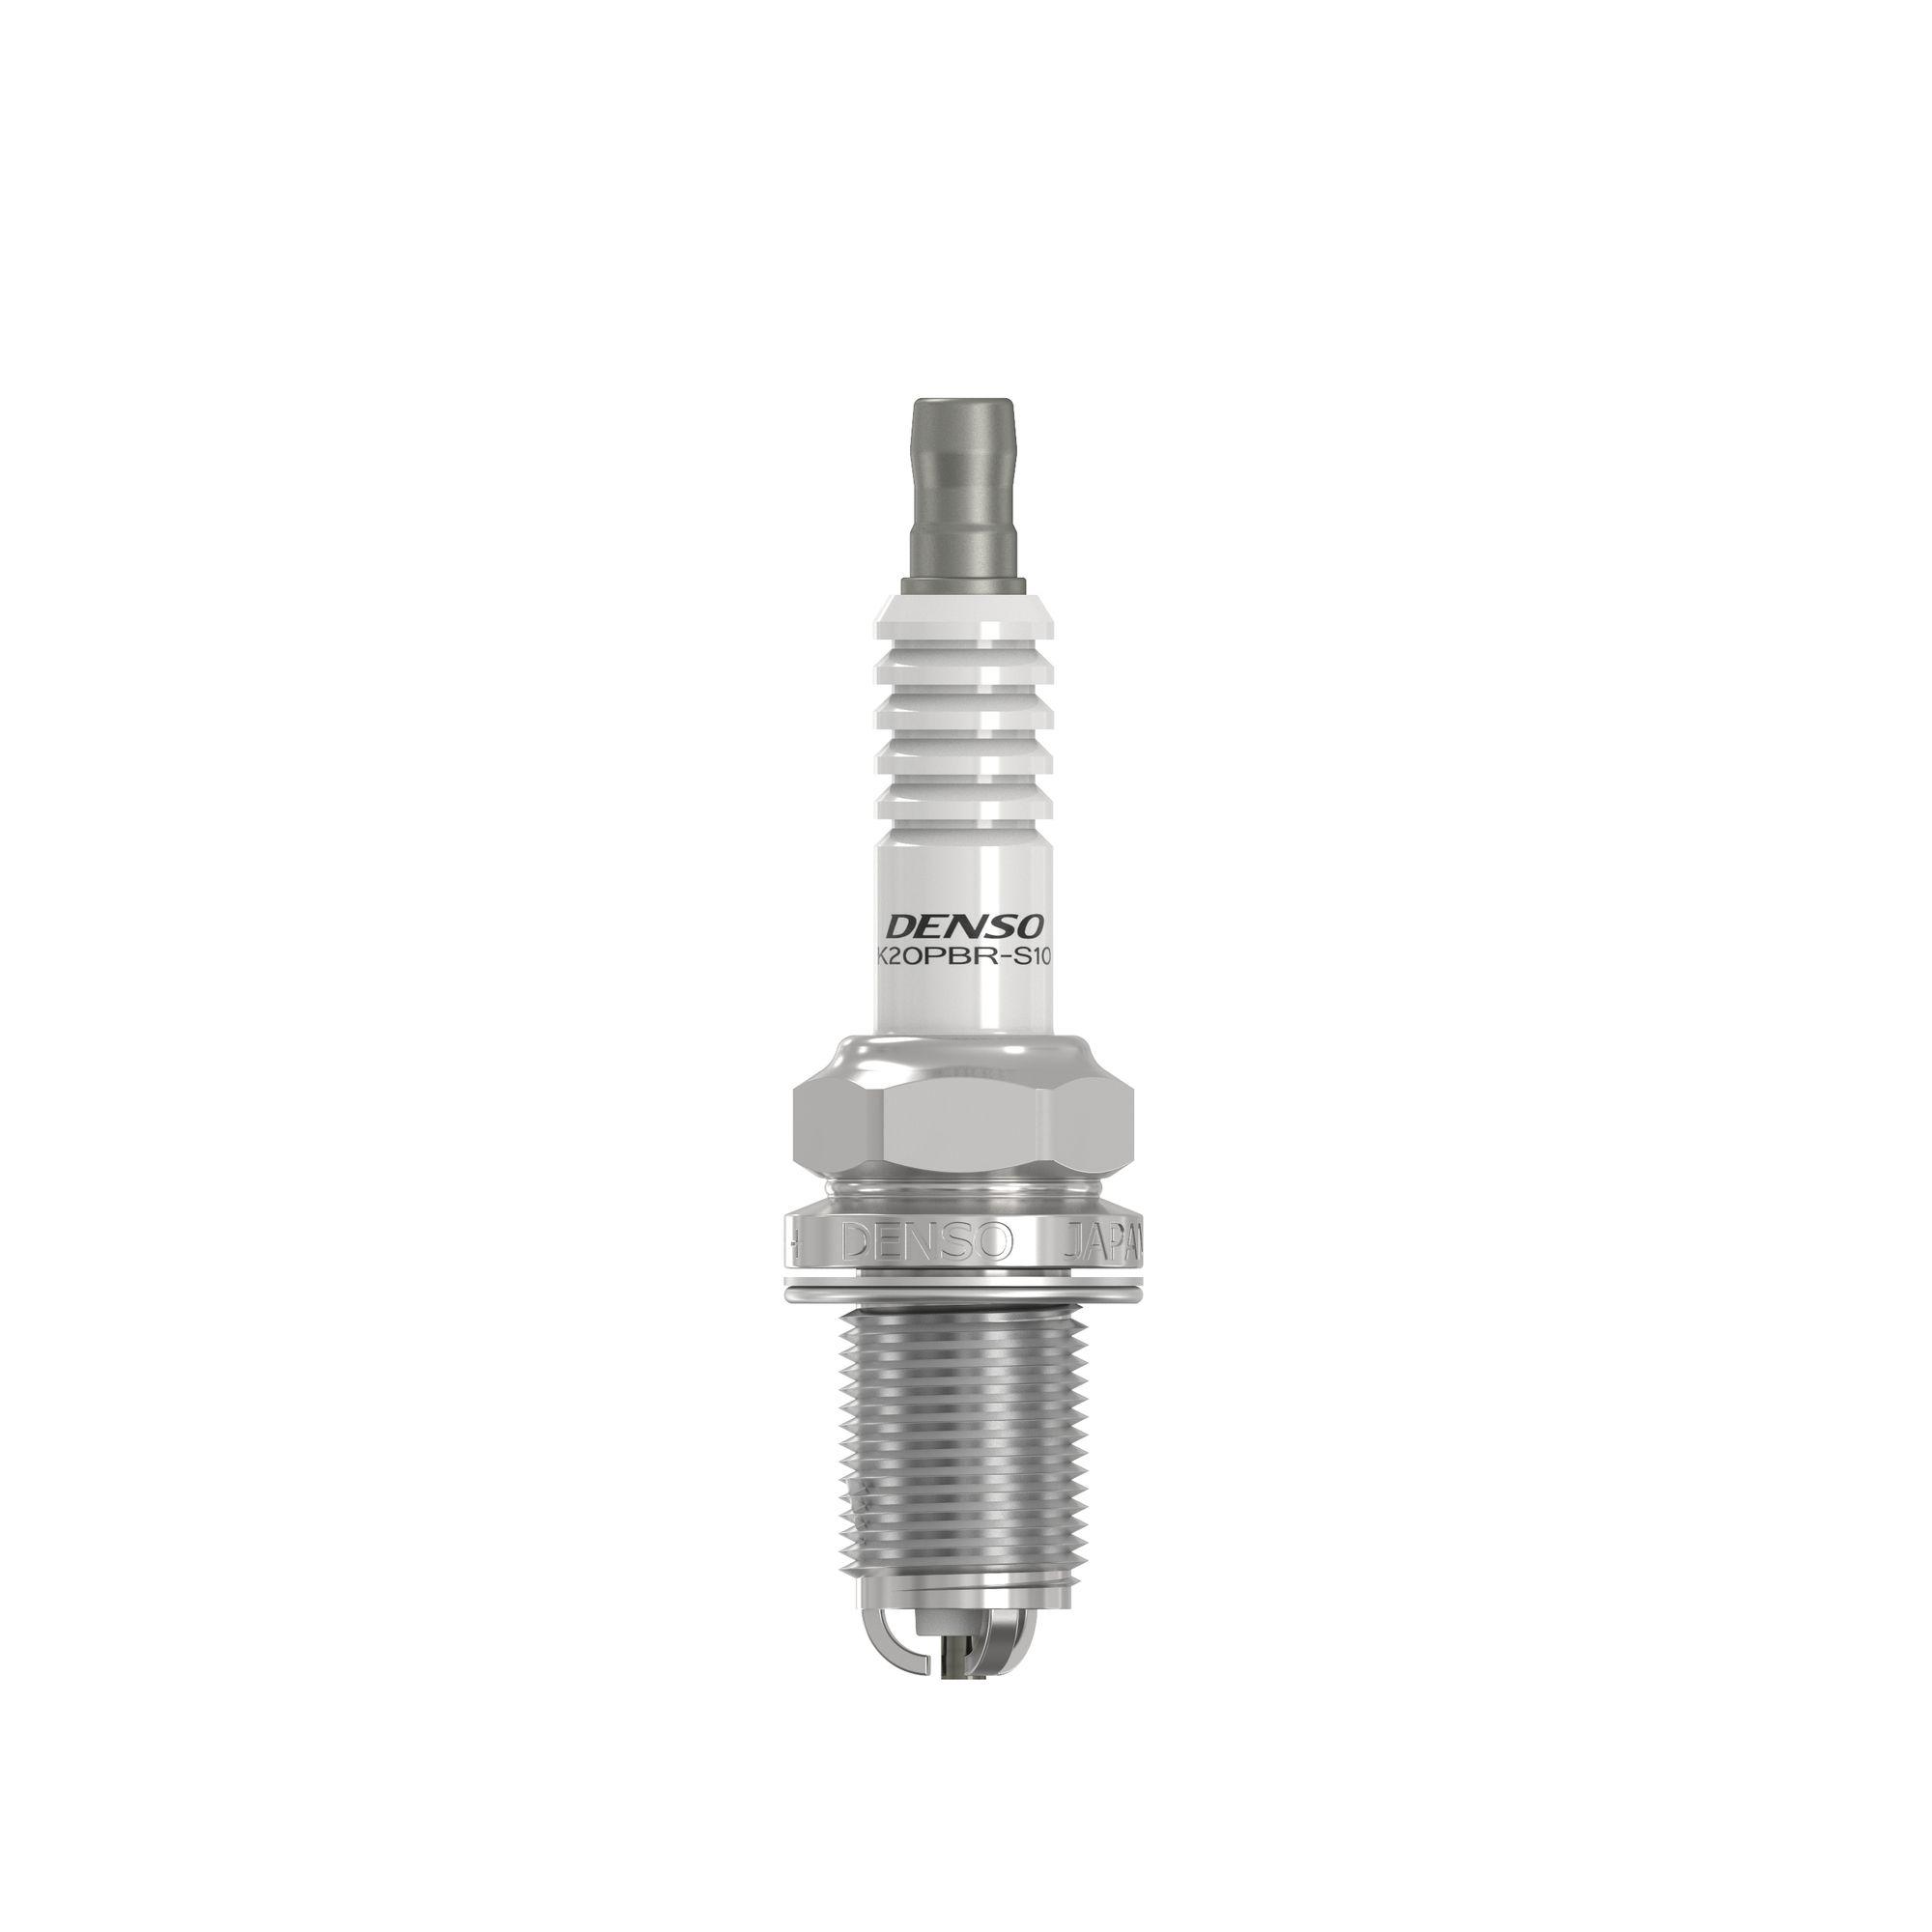 Sytytystulppa K20PBR-S10 varten VOLVO S60 alennuksella — osta nyt!